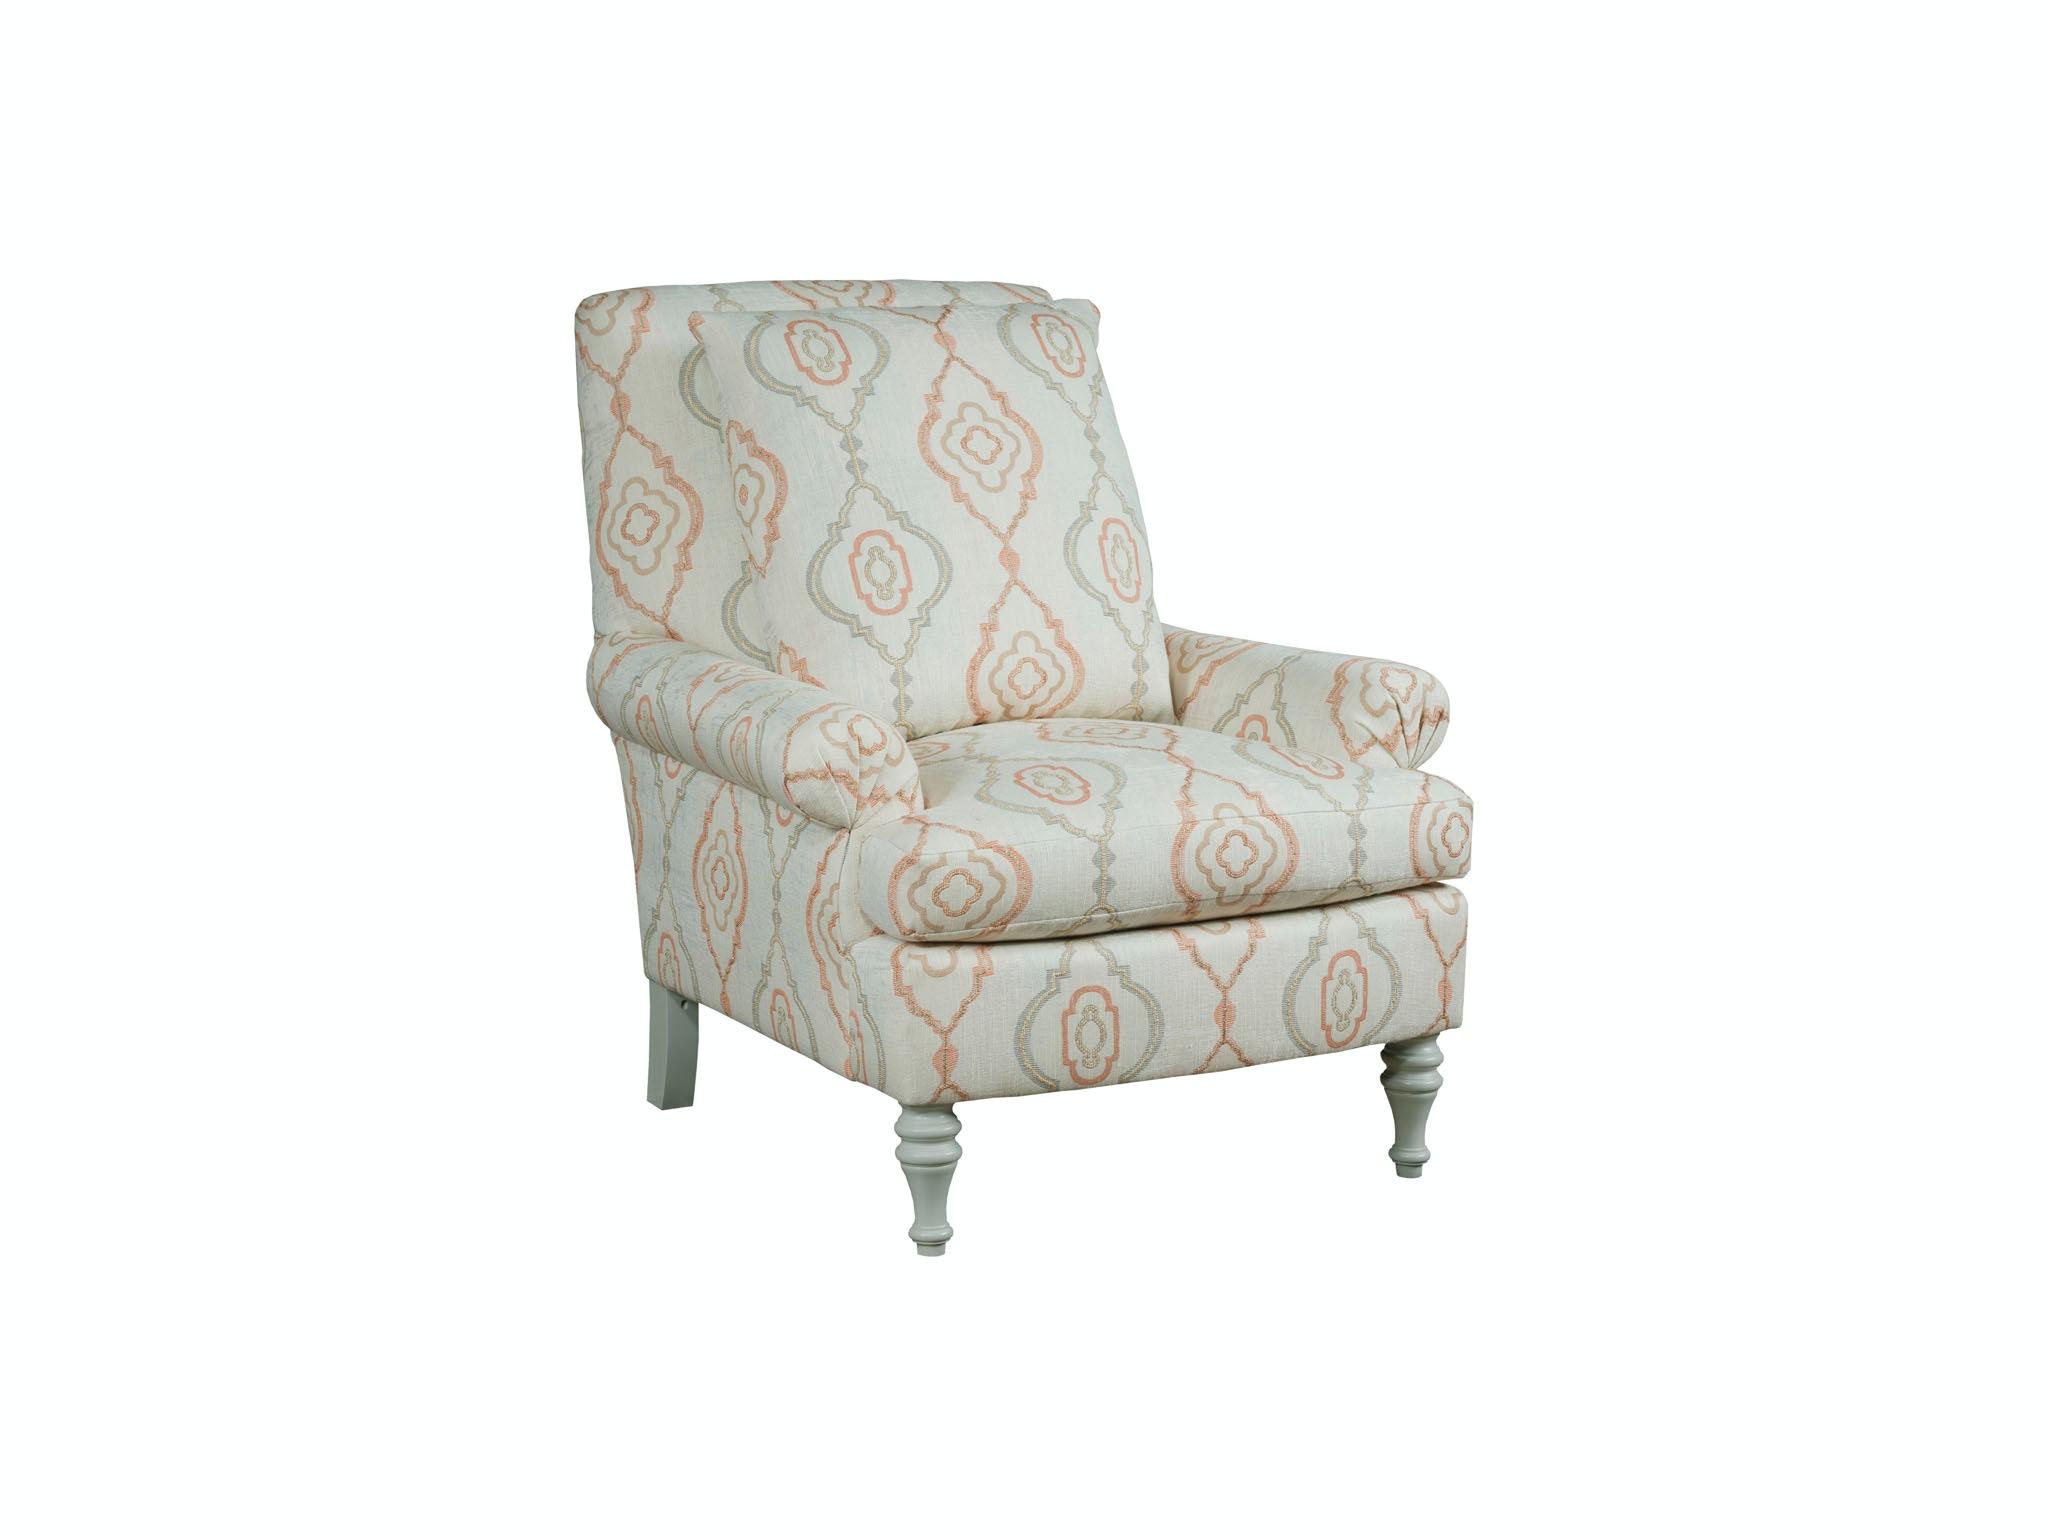 Kincaid Furniture Holden Chair 014 00